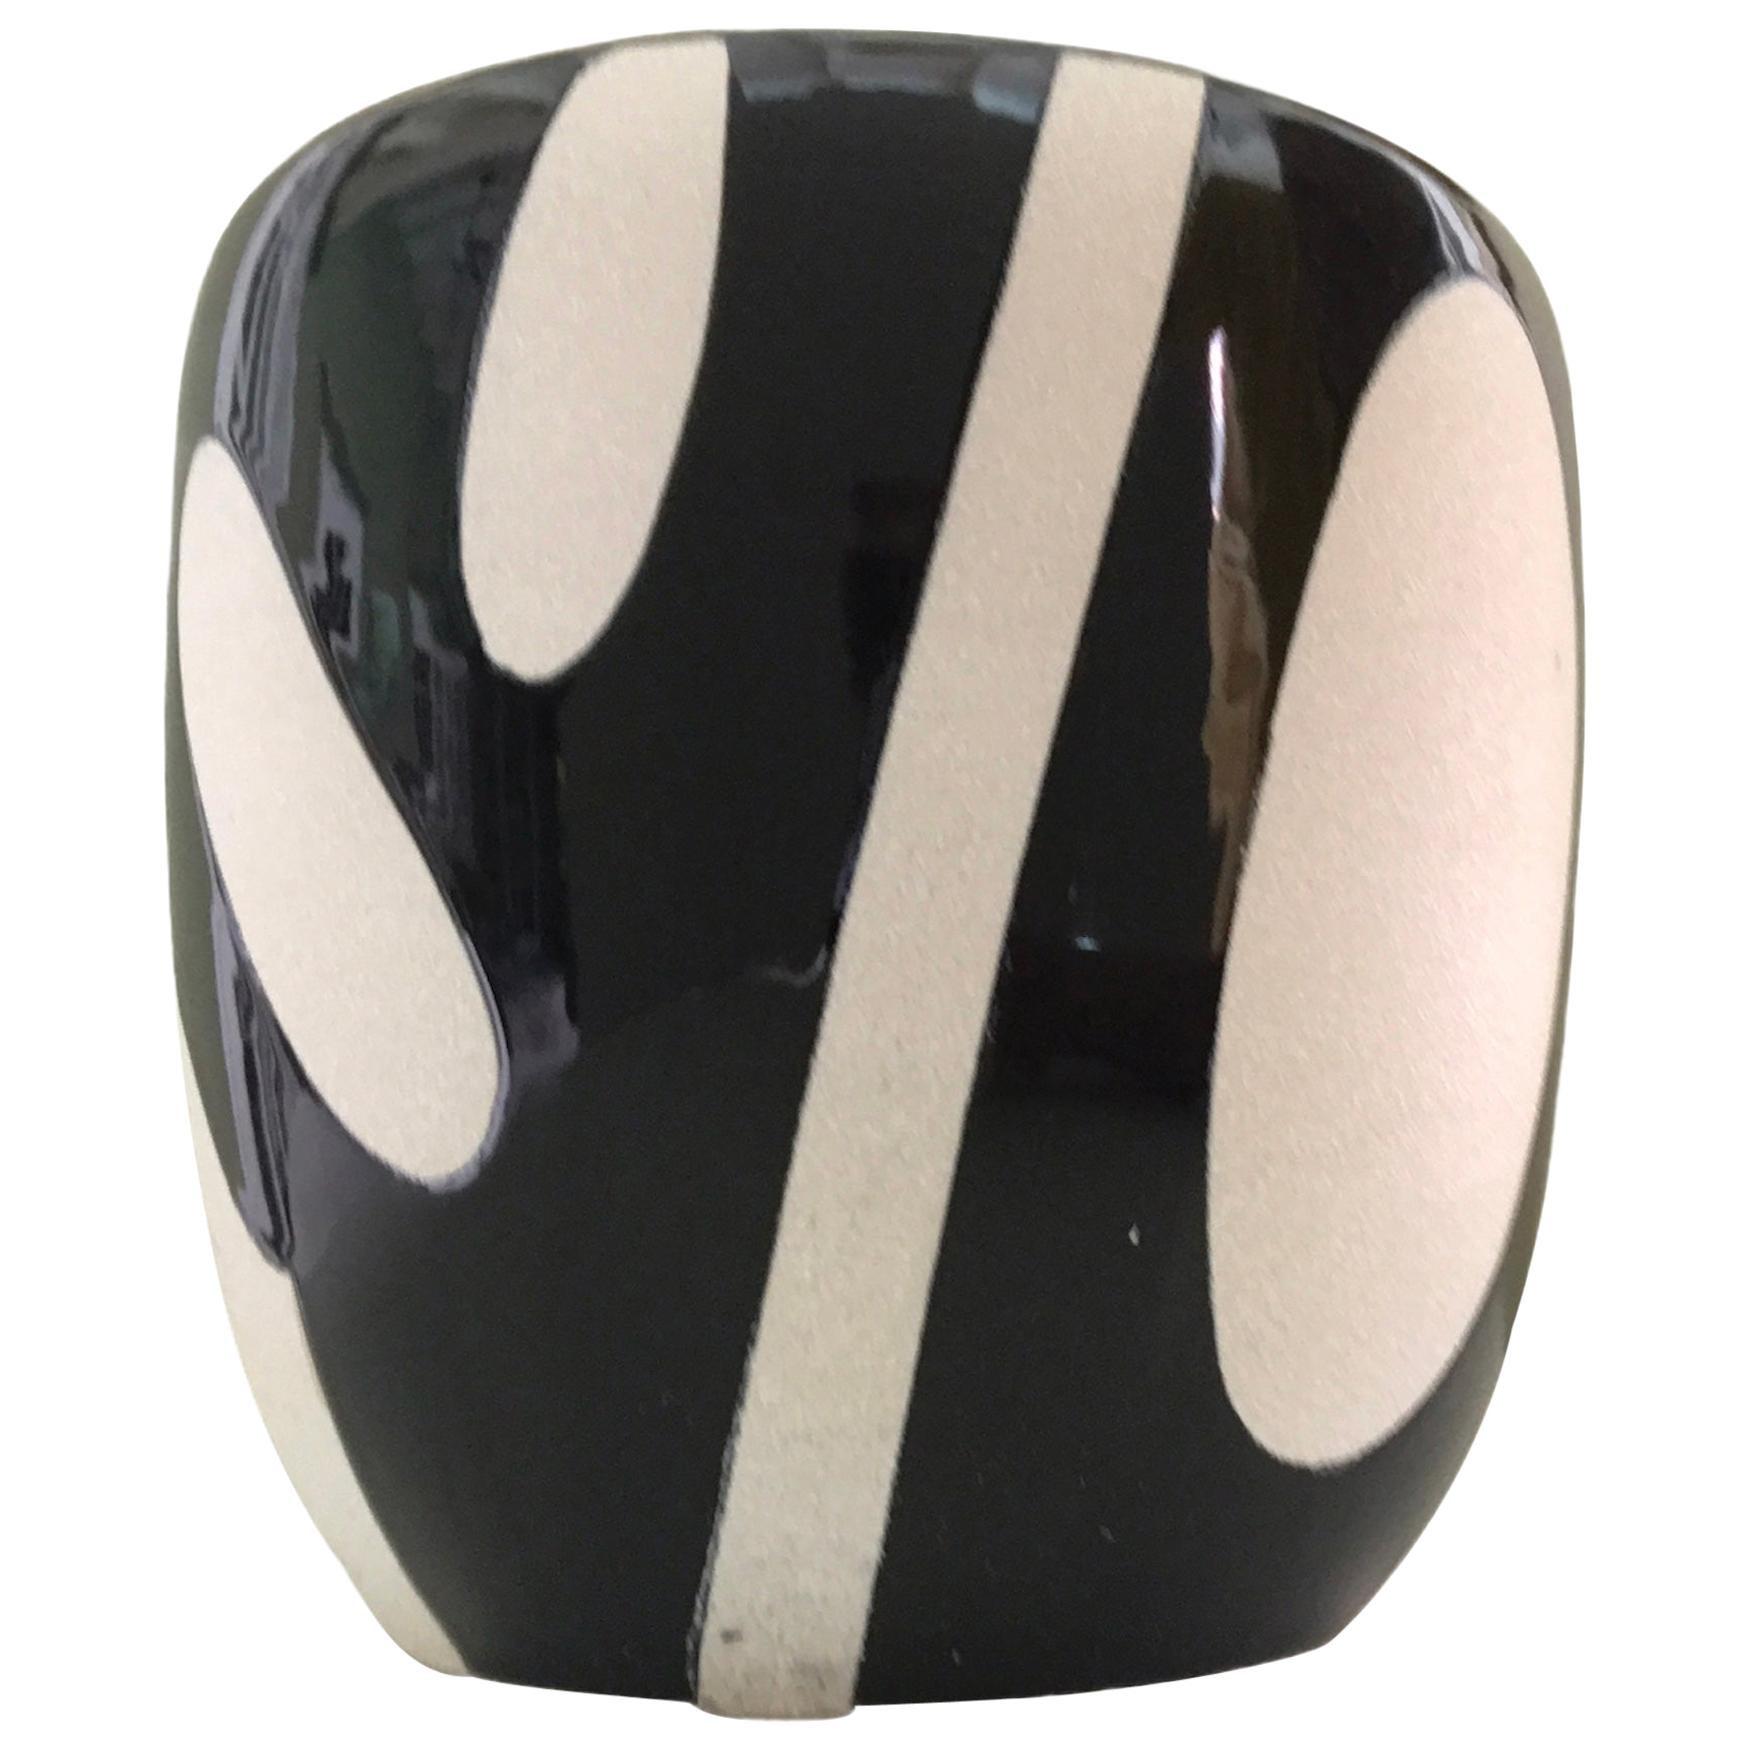 1960s Modern Black and White Ceramic Hibachi, Japan